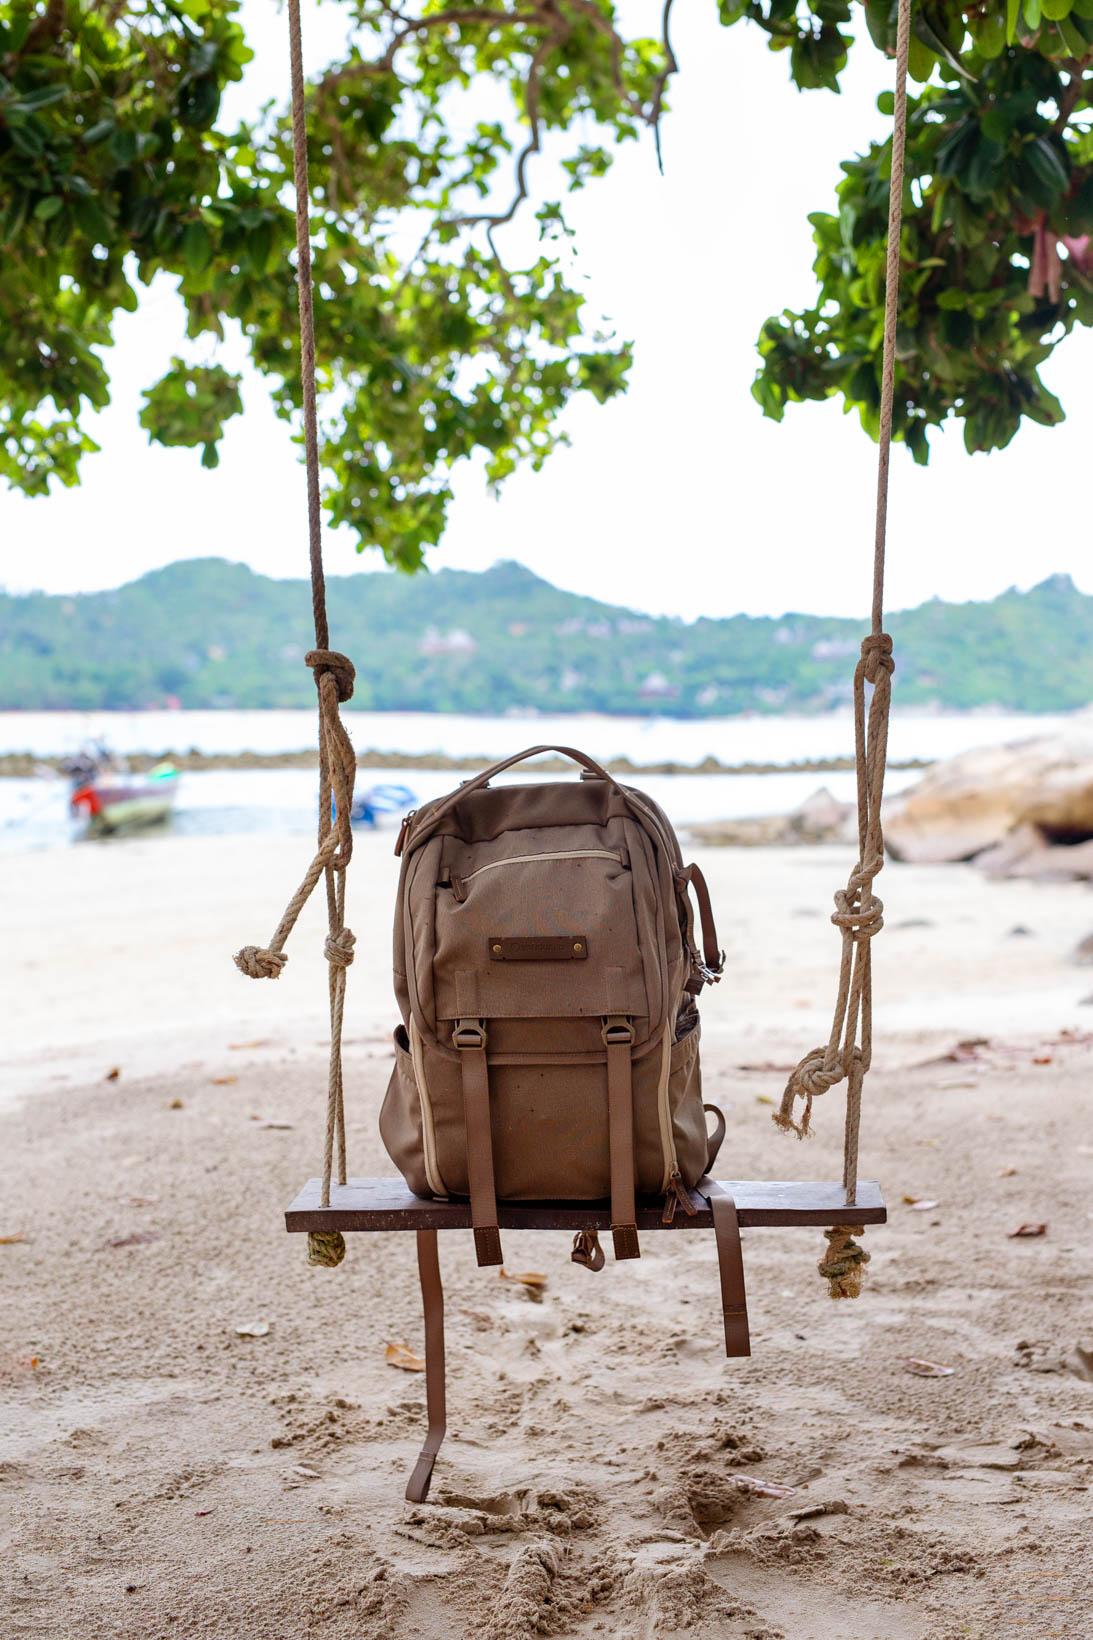 Fotorucksack_Kamerarucksack_Vanguard_Reisen_Thailand (24)